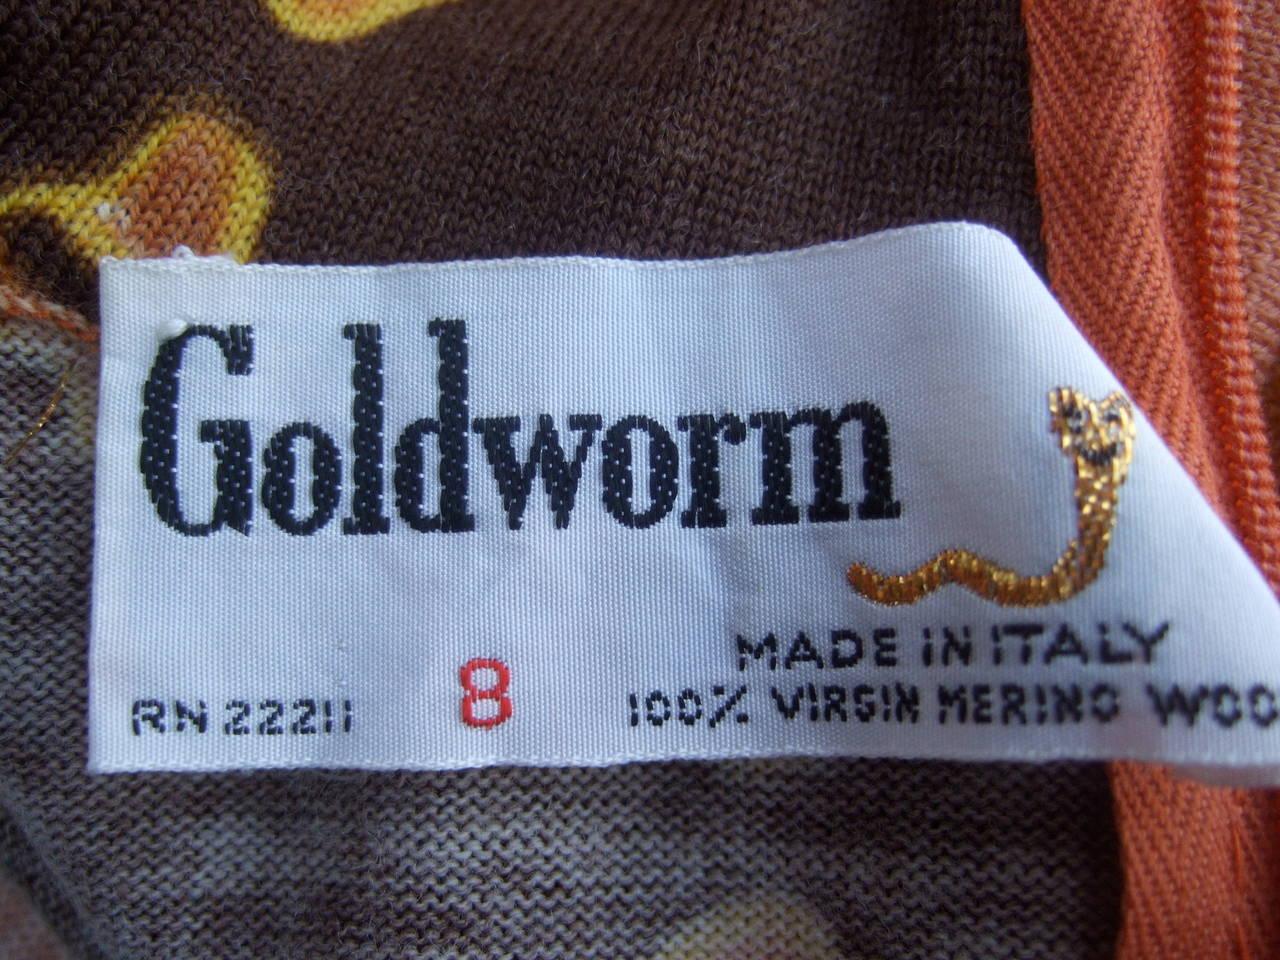 Italian Floral Print Merino Wool Knit Dress c 1970s For Sale 4